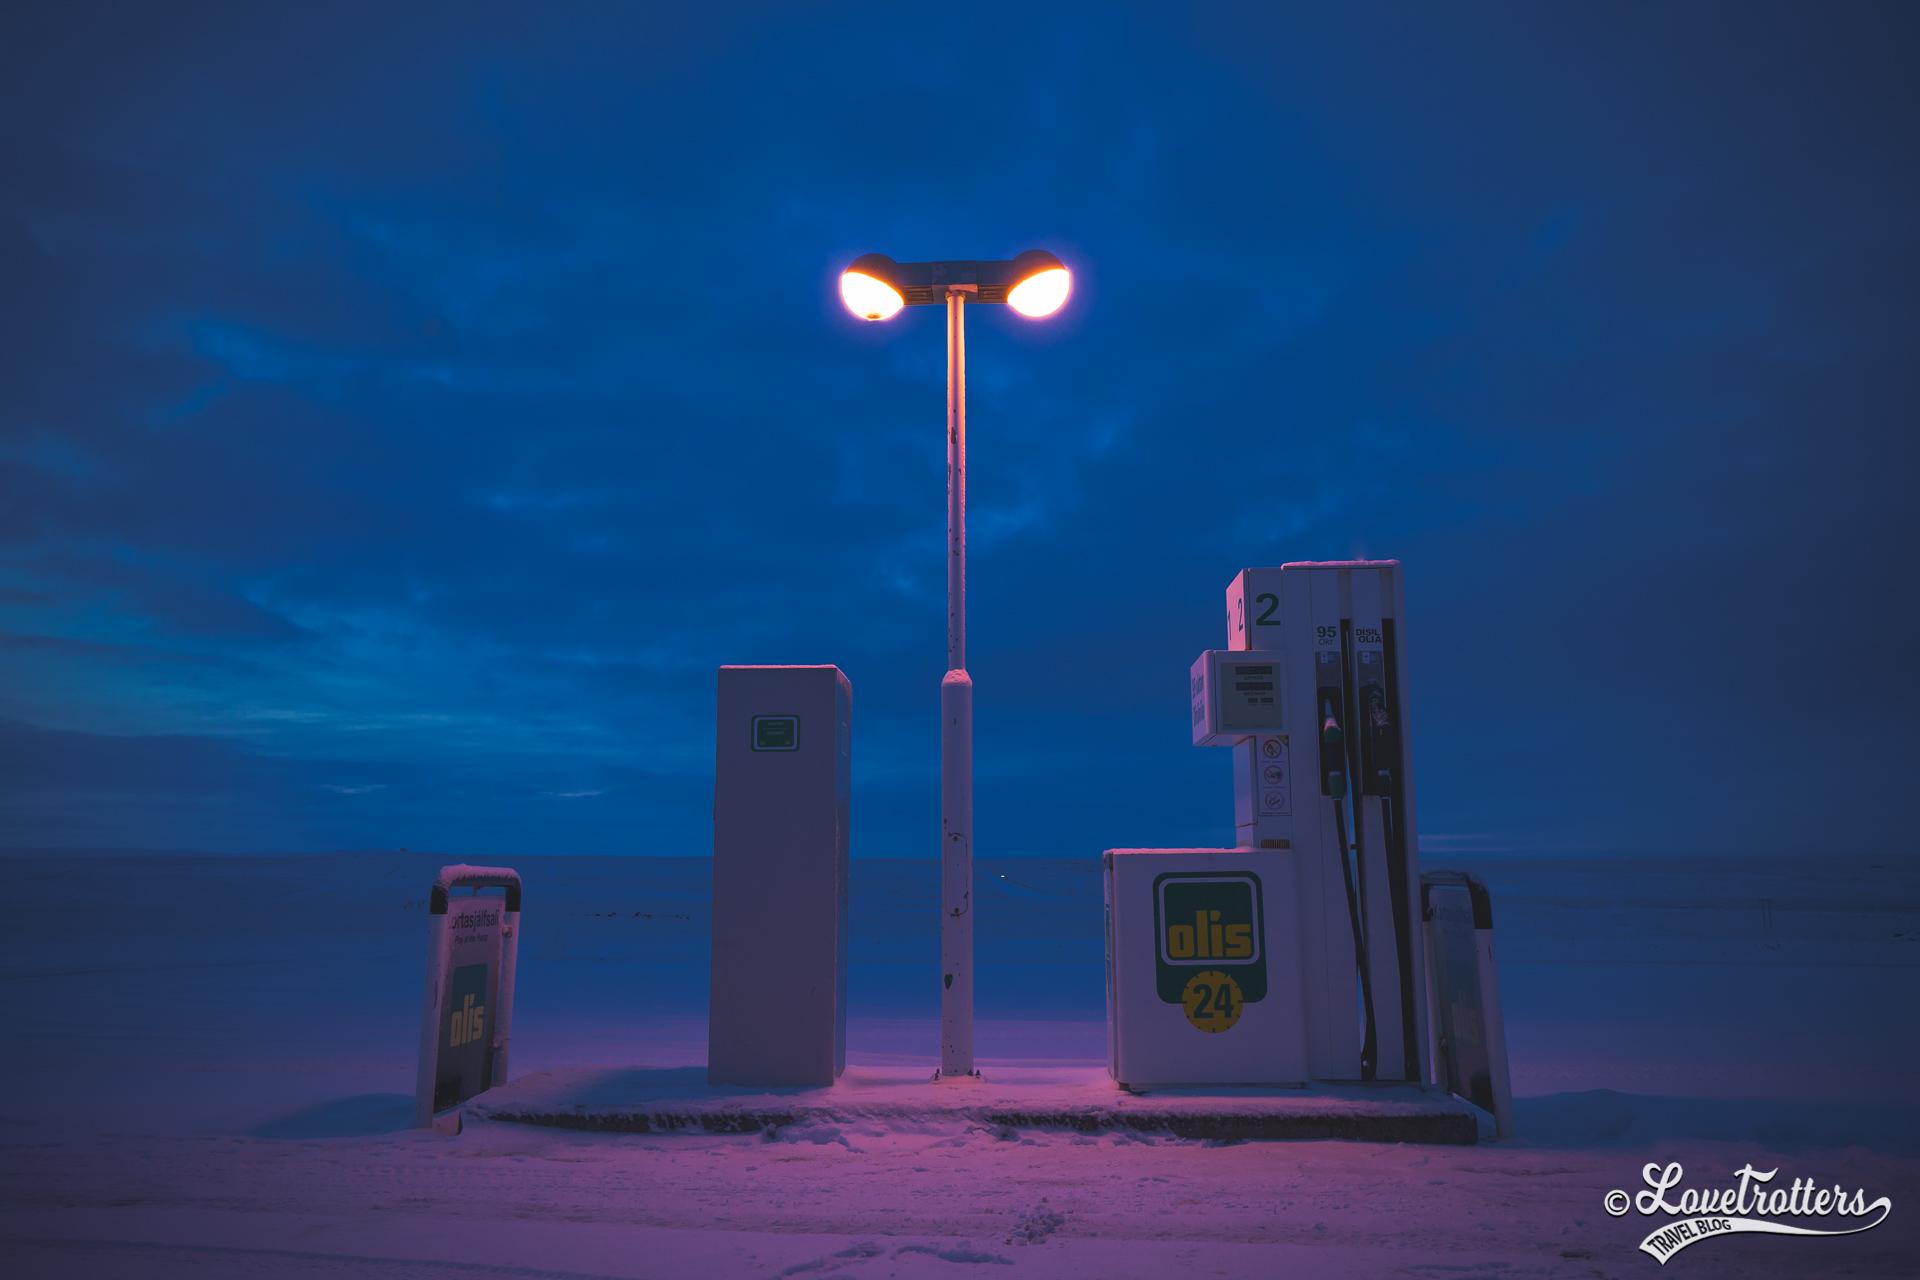 Station d'essence road trip en Islande l'hiver